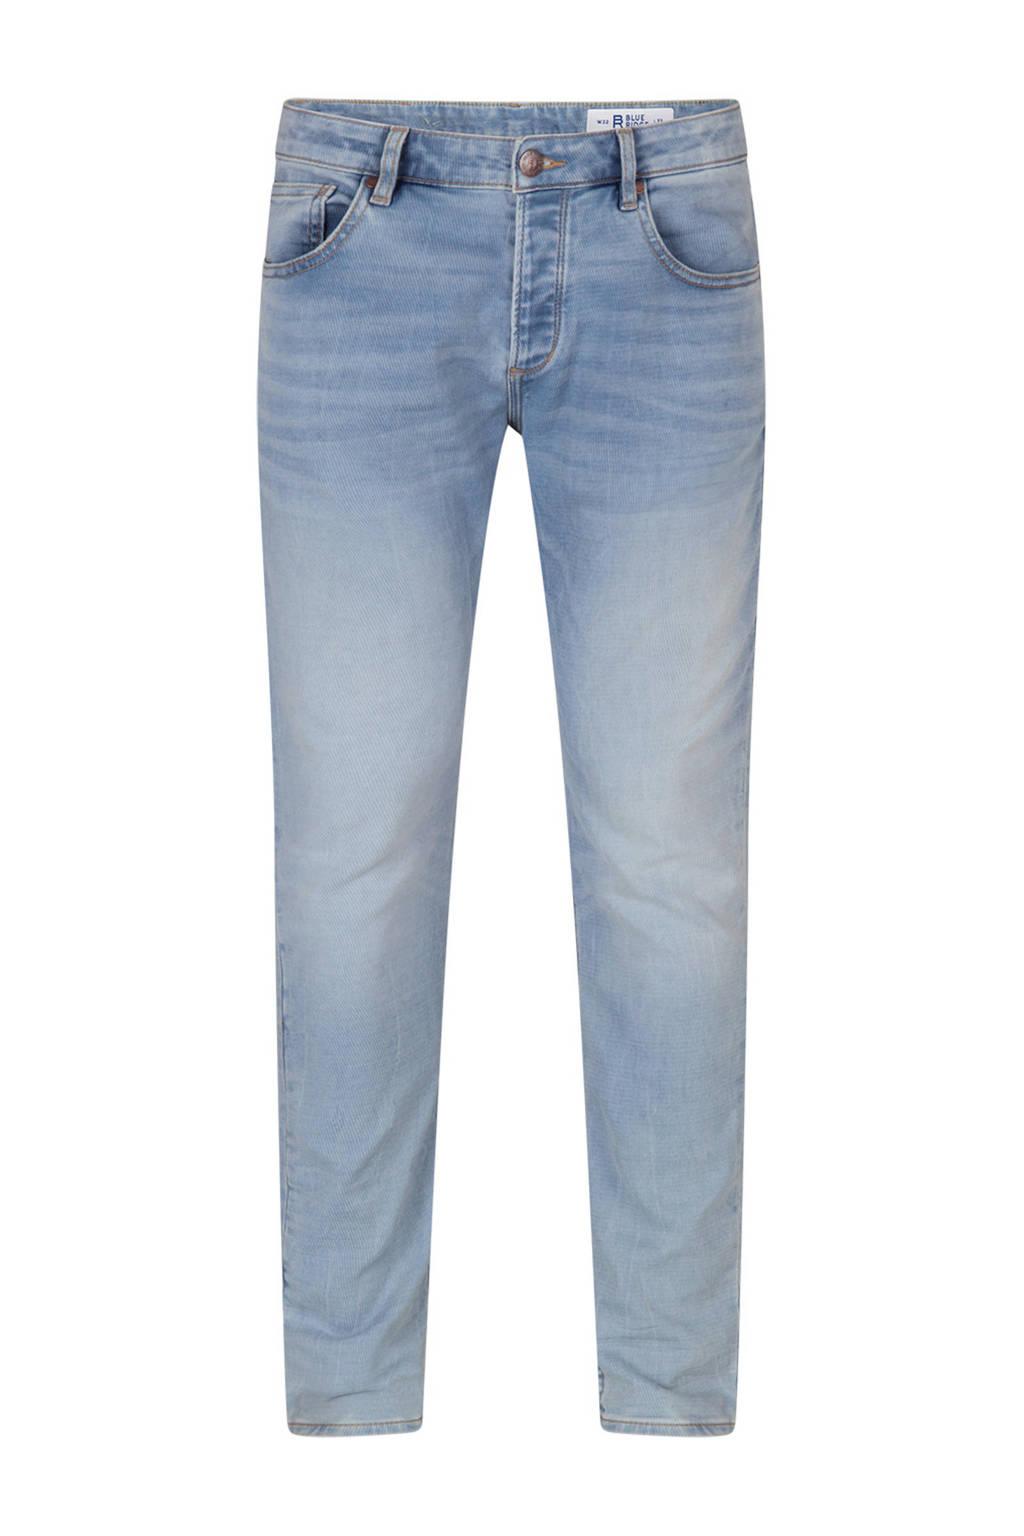 WE Fashion Blue Ridge slim fit jeans, Blauw